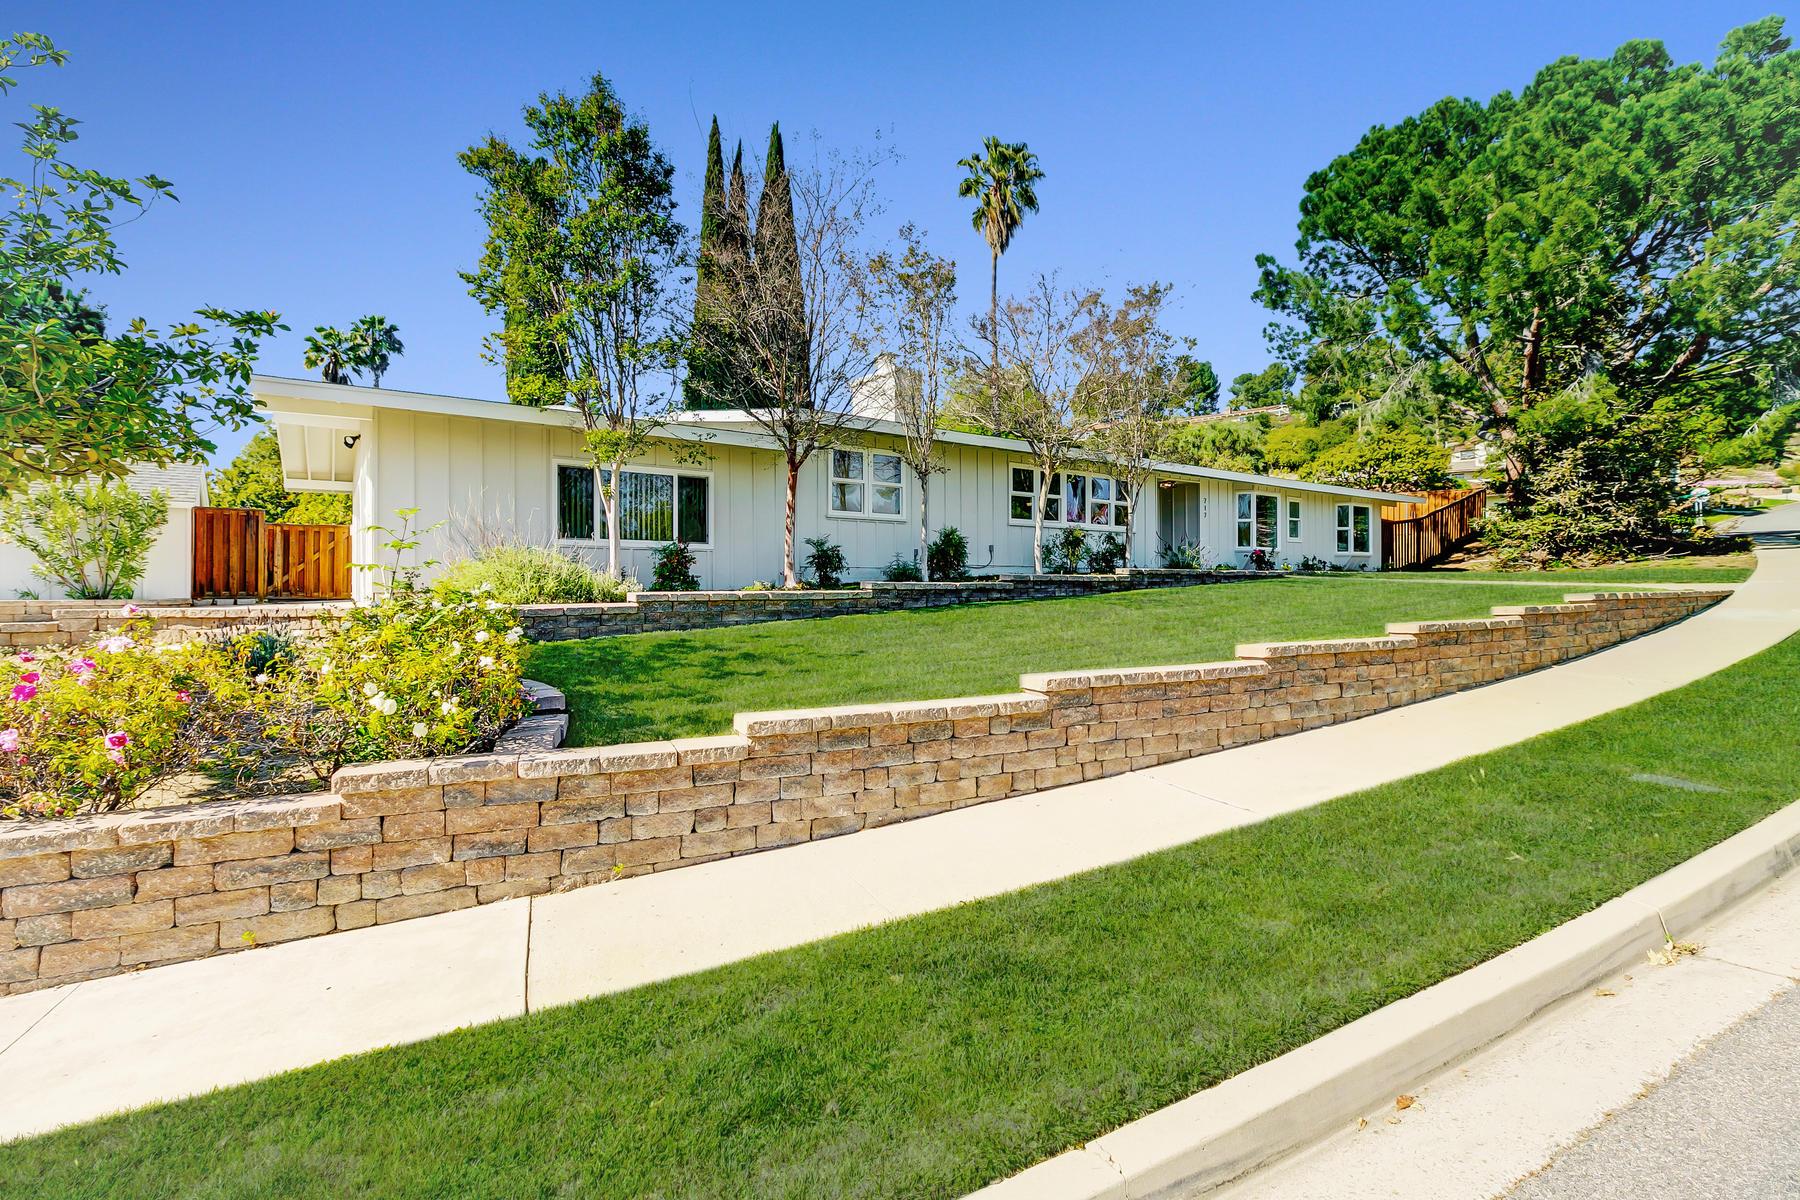 Single Family Homes for Active at 717 CALLE MANDARINAS Thousand Oaks, California 91360 United States